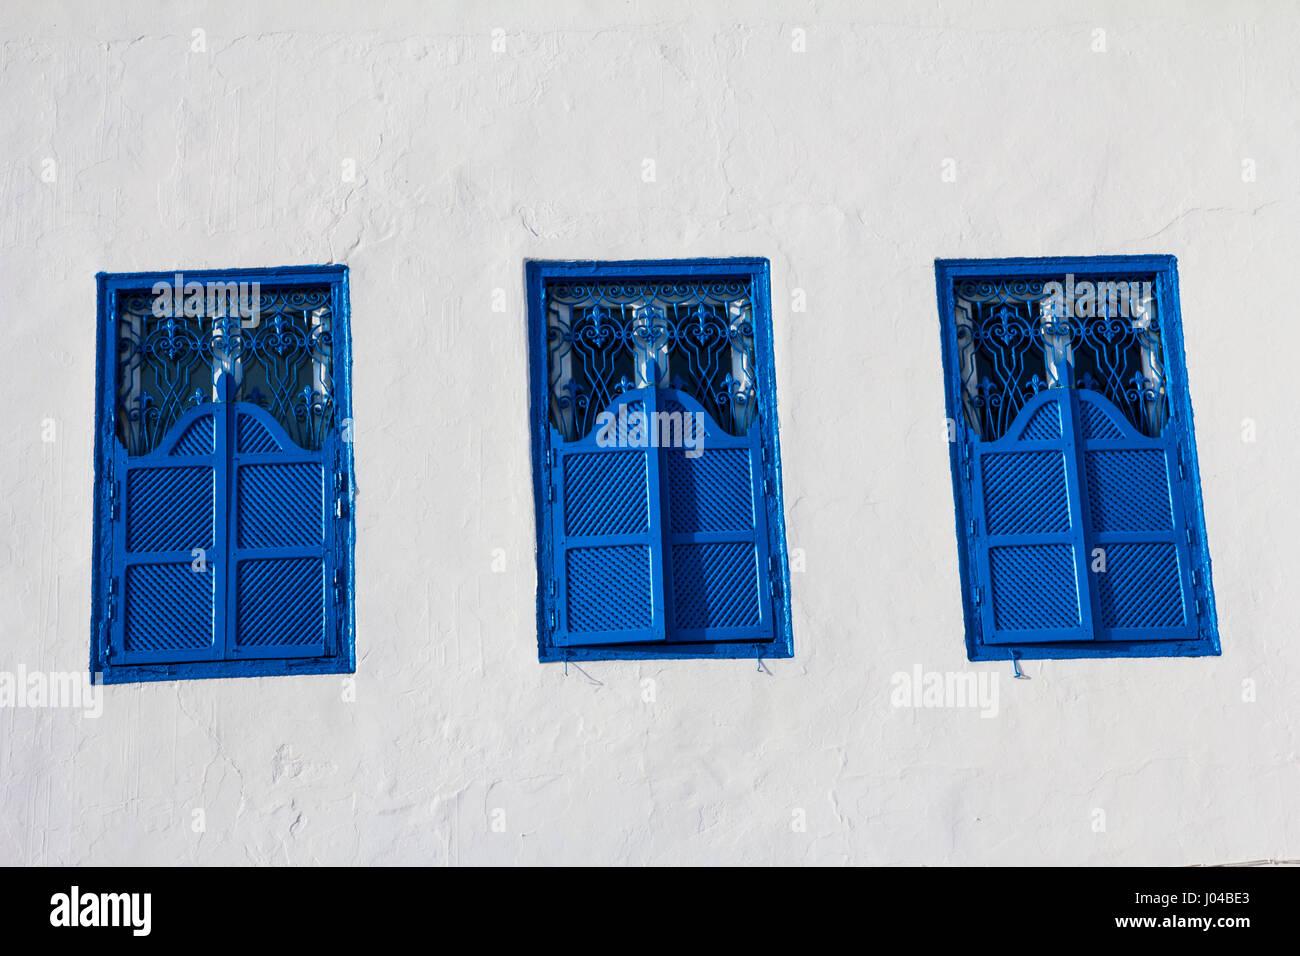 Blue shuttered windows in Sidi Bou Said, Tunisia. - Stock Image